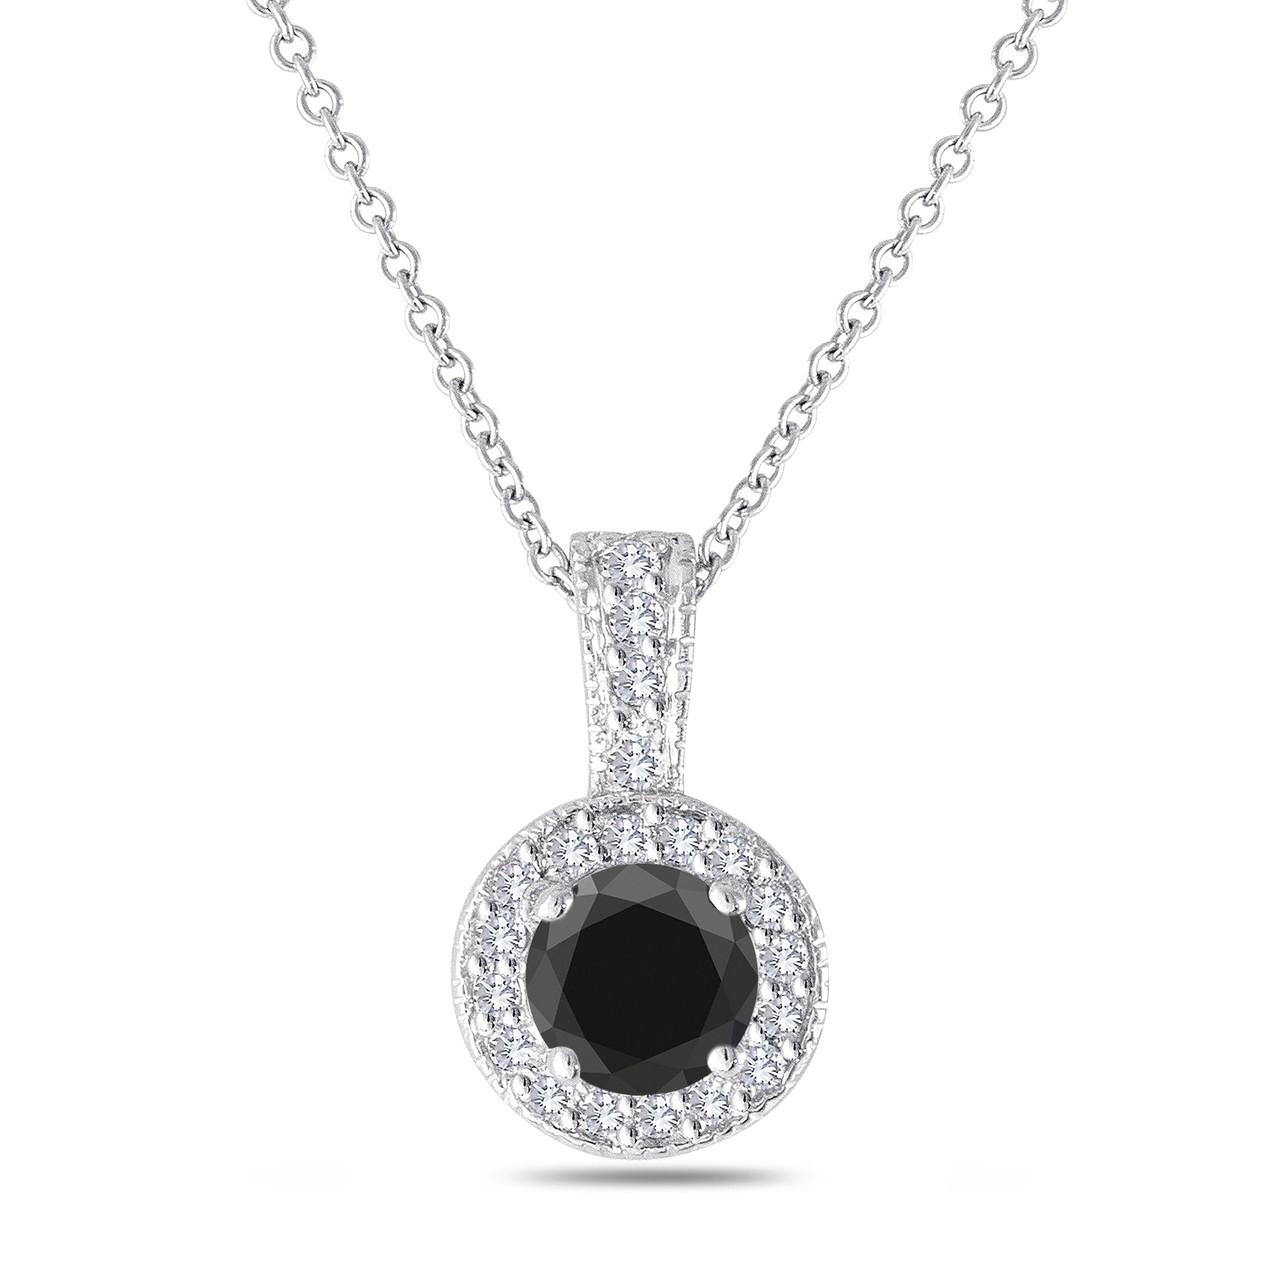 Fancy Black Amp White Diamond Pendant Necklace 14k White